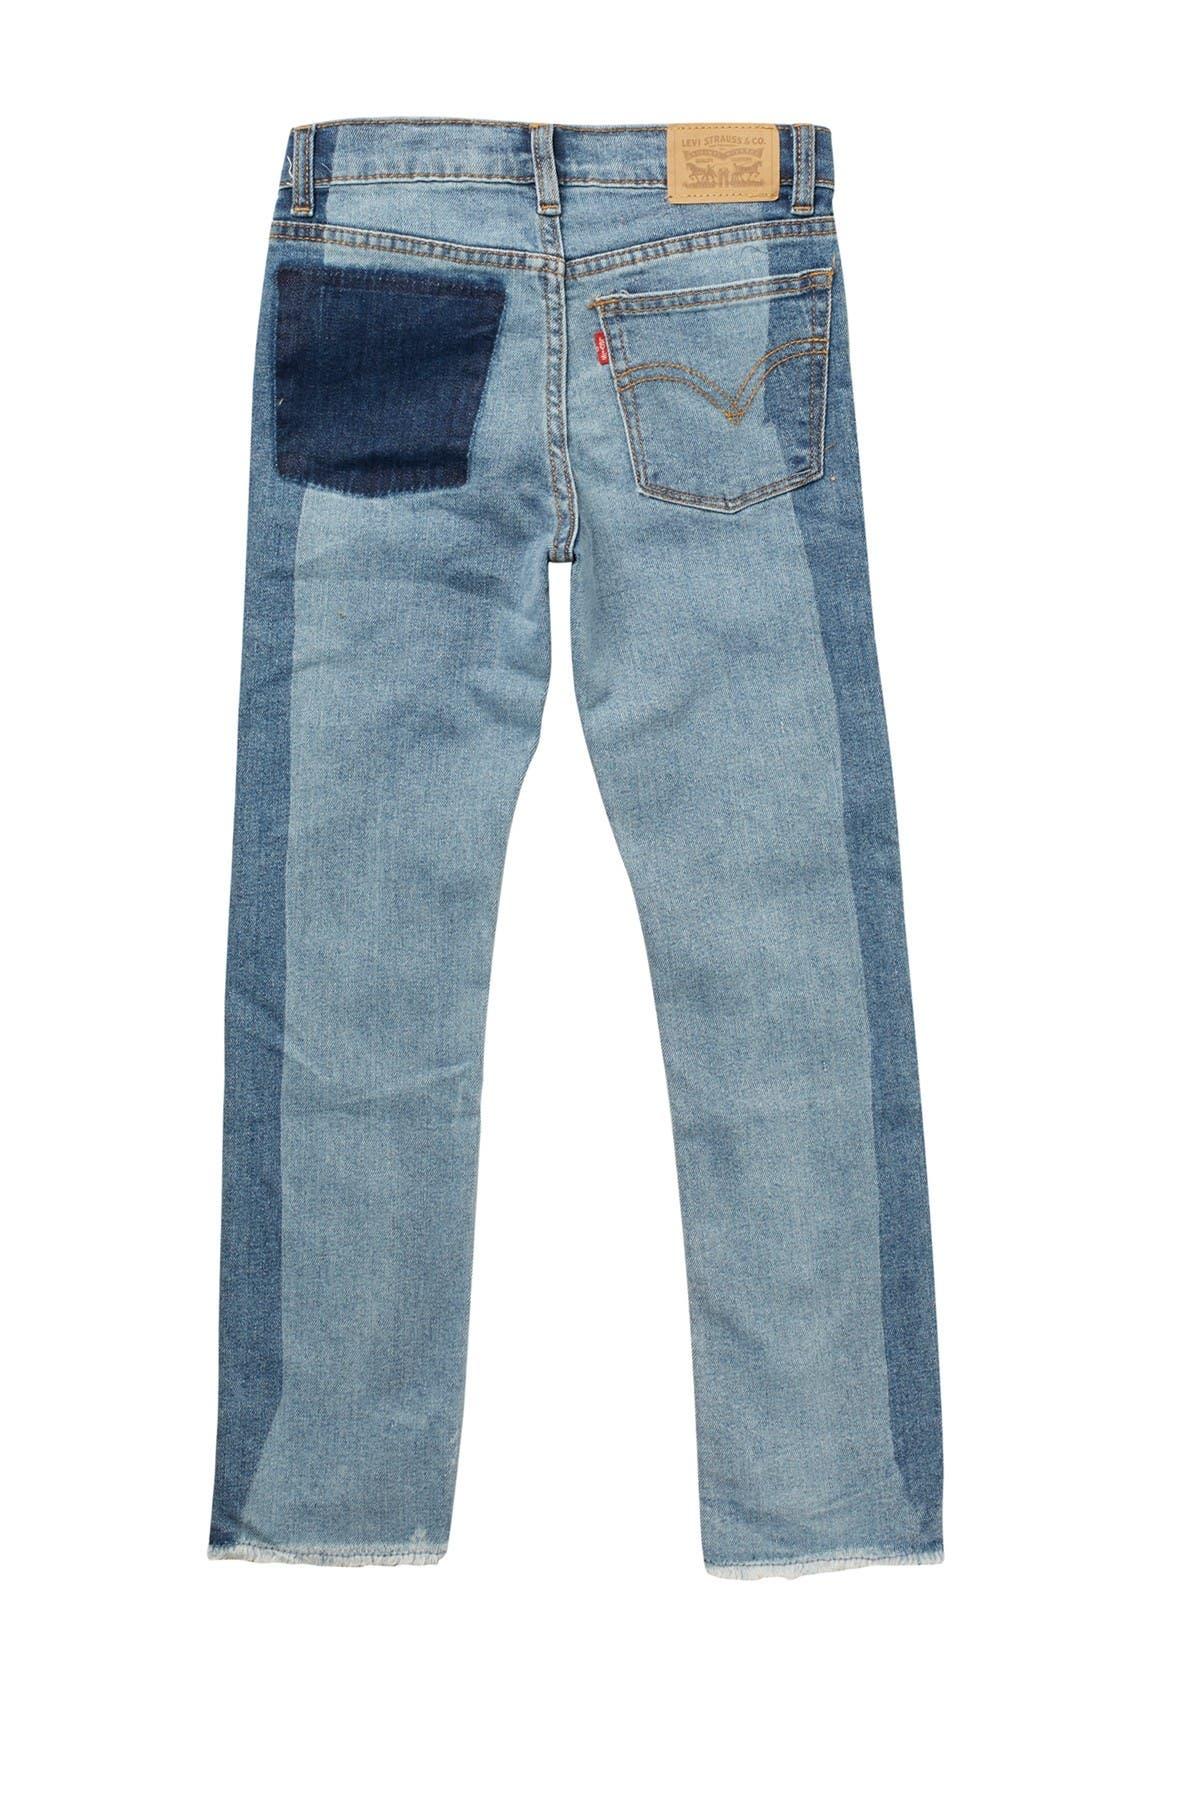 Levi's Frayed Step Hem Girlfriend Jeans